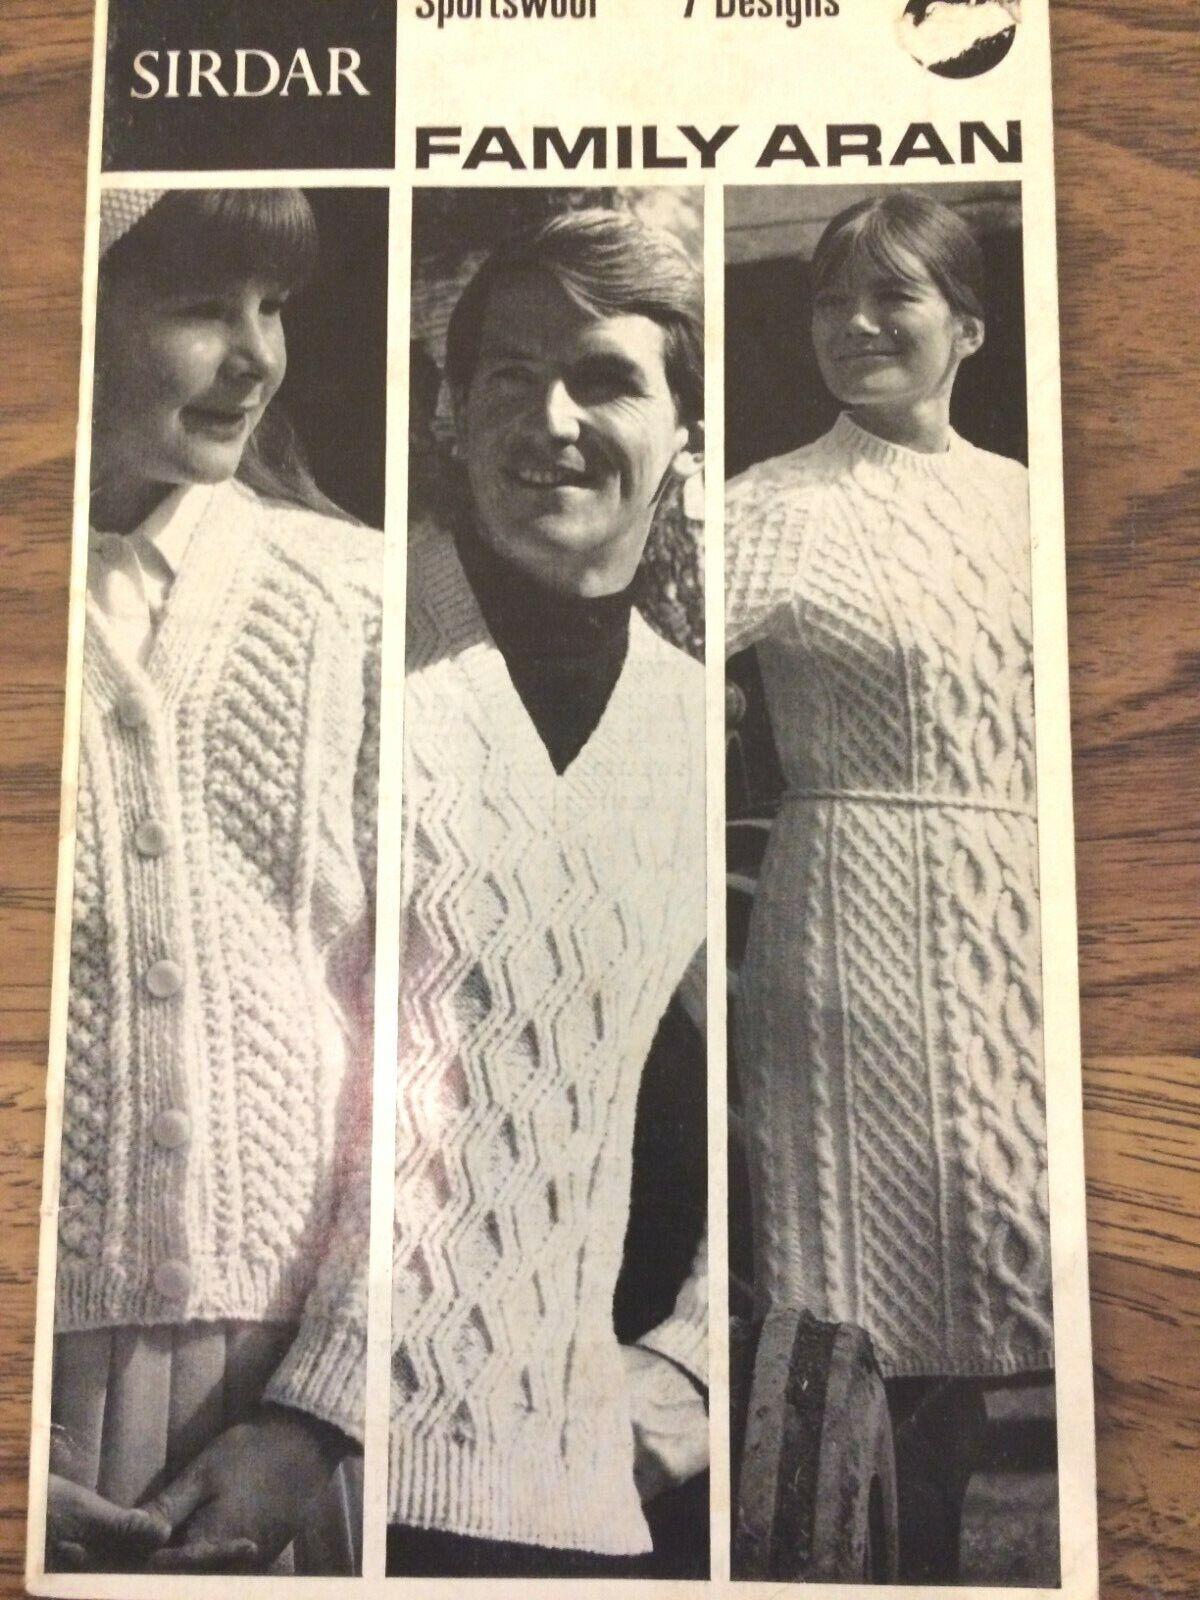 Sirdar Family ARAN Knitting Vintage Pattern Book 7 Designs 36 Pages 1967 Lot716 - $5.00